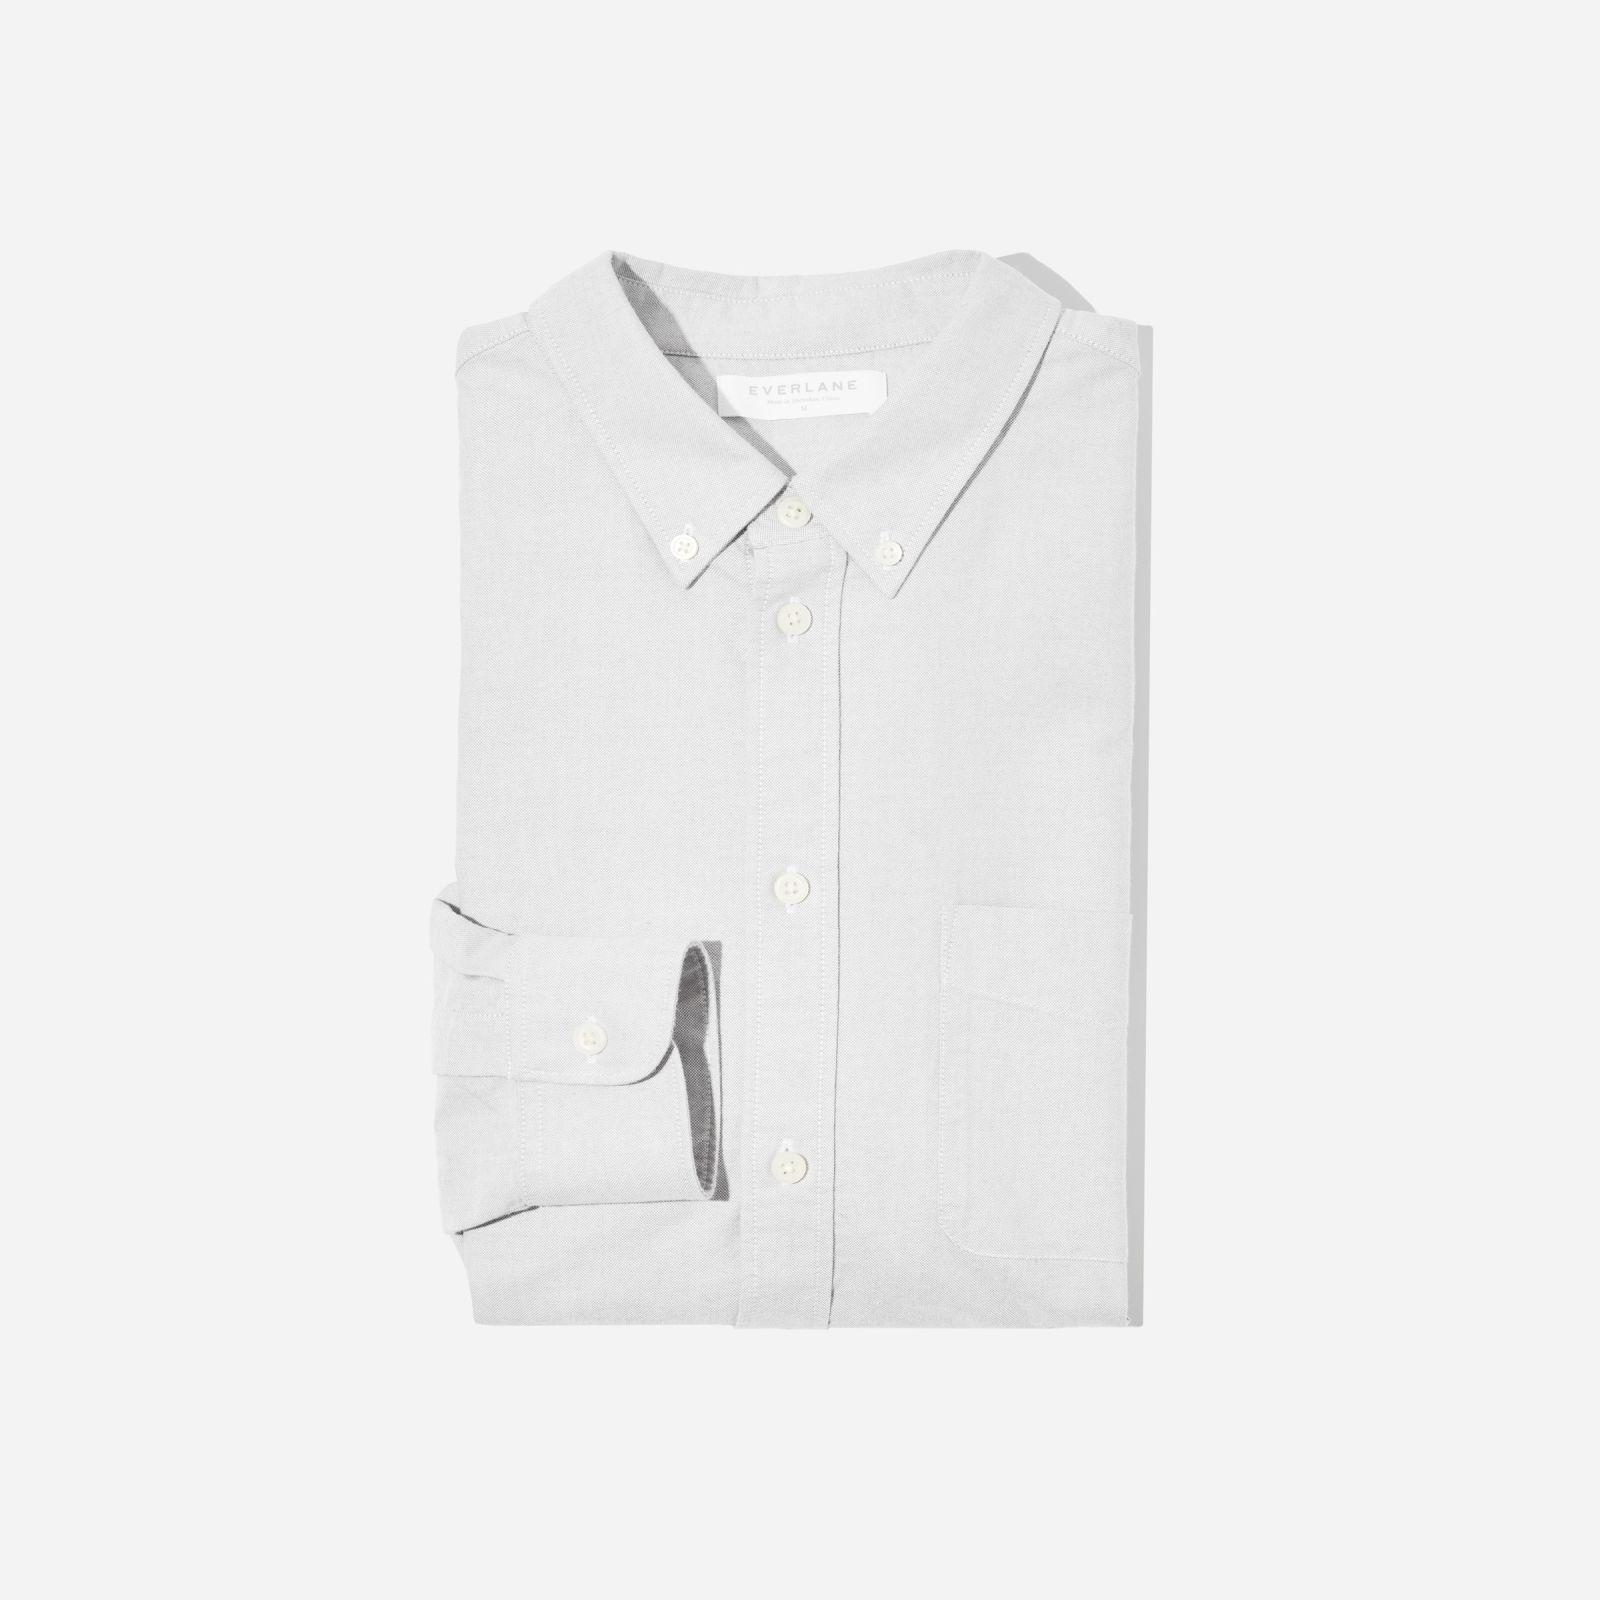 men's japanese slim fit oxford shirt by everlane in denim/navy, size xl